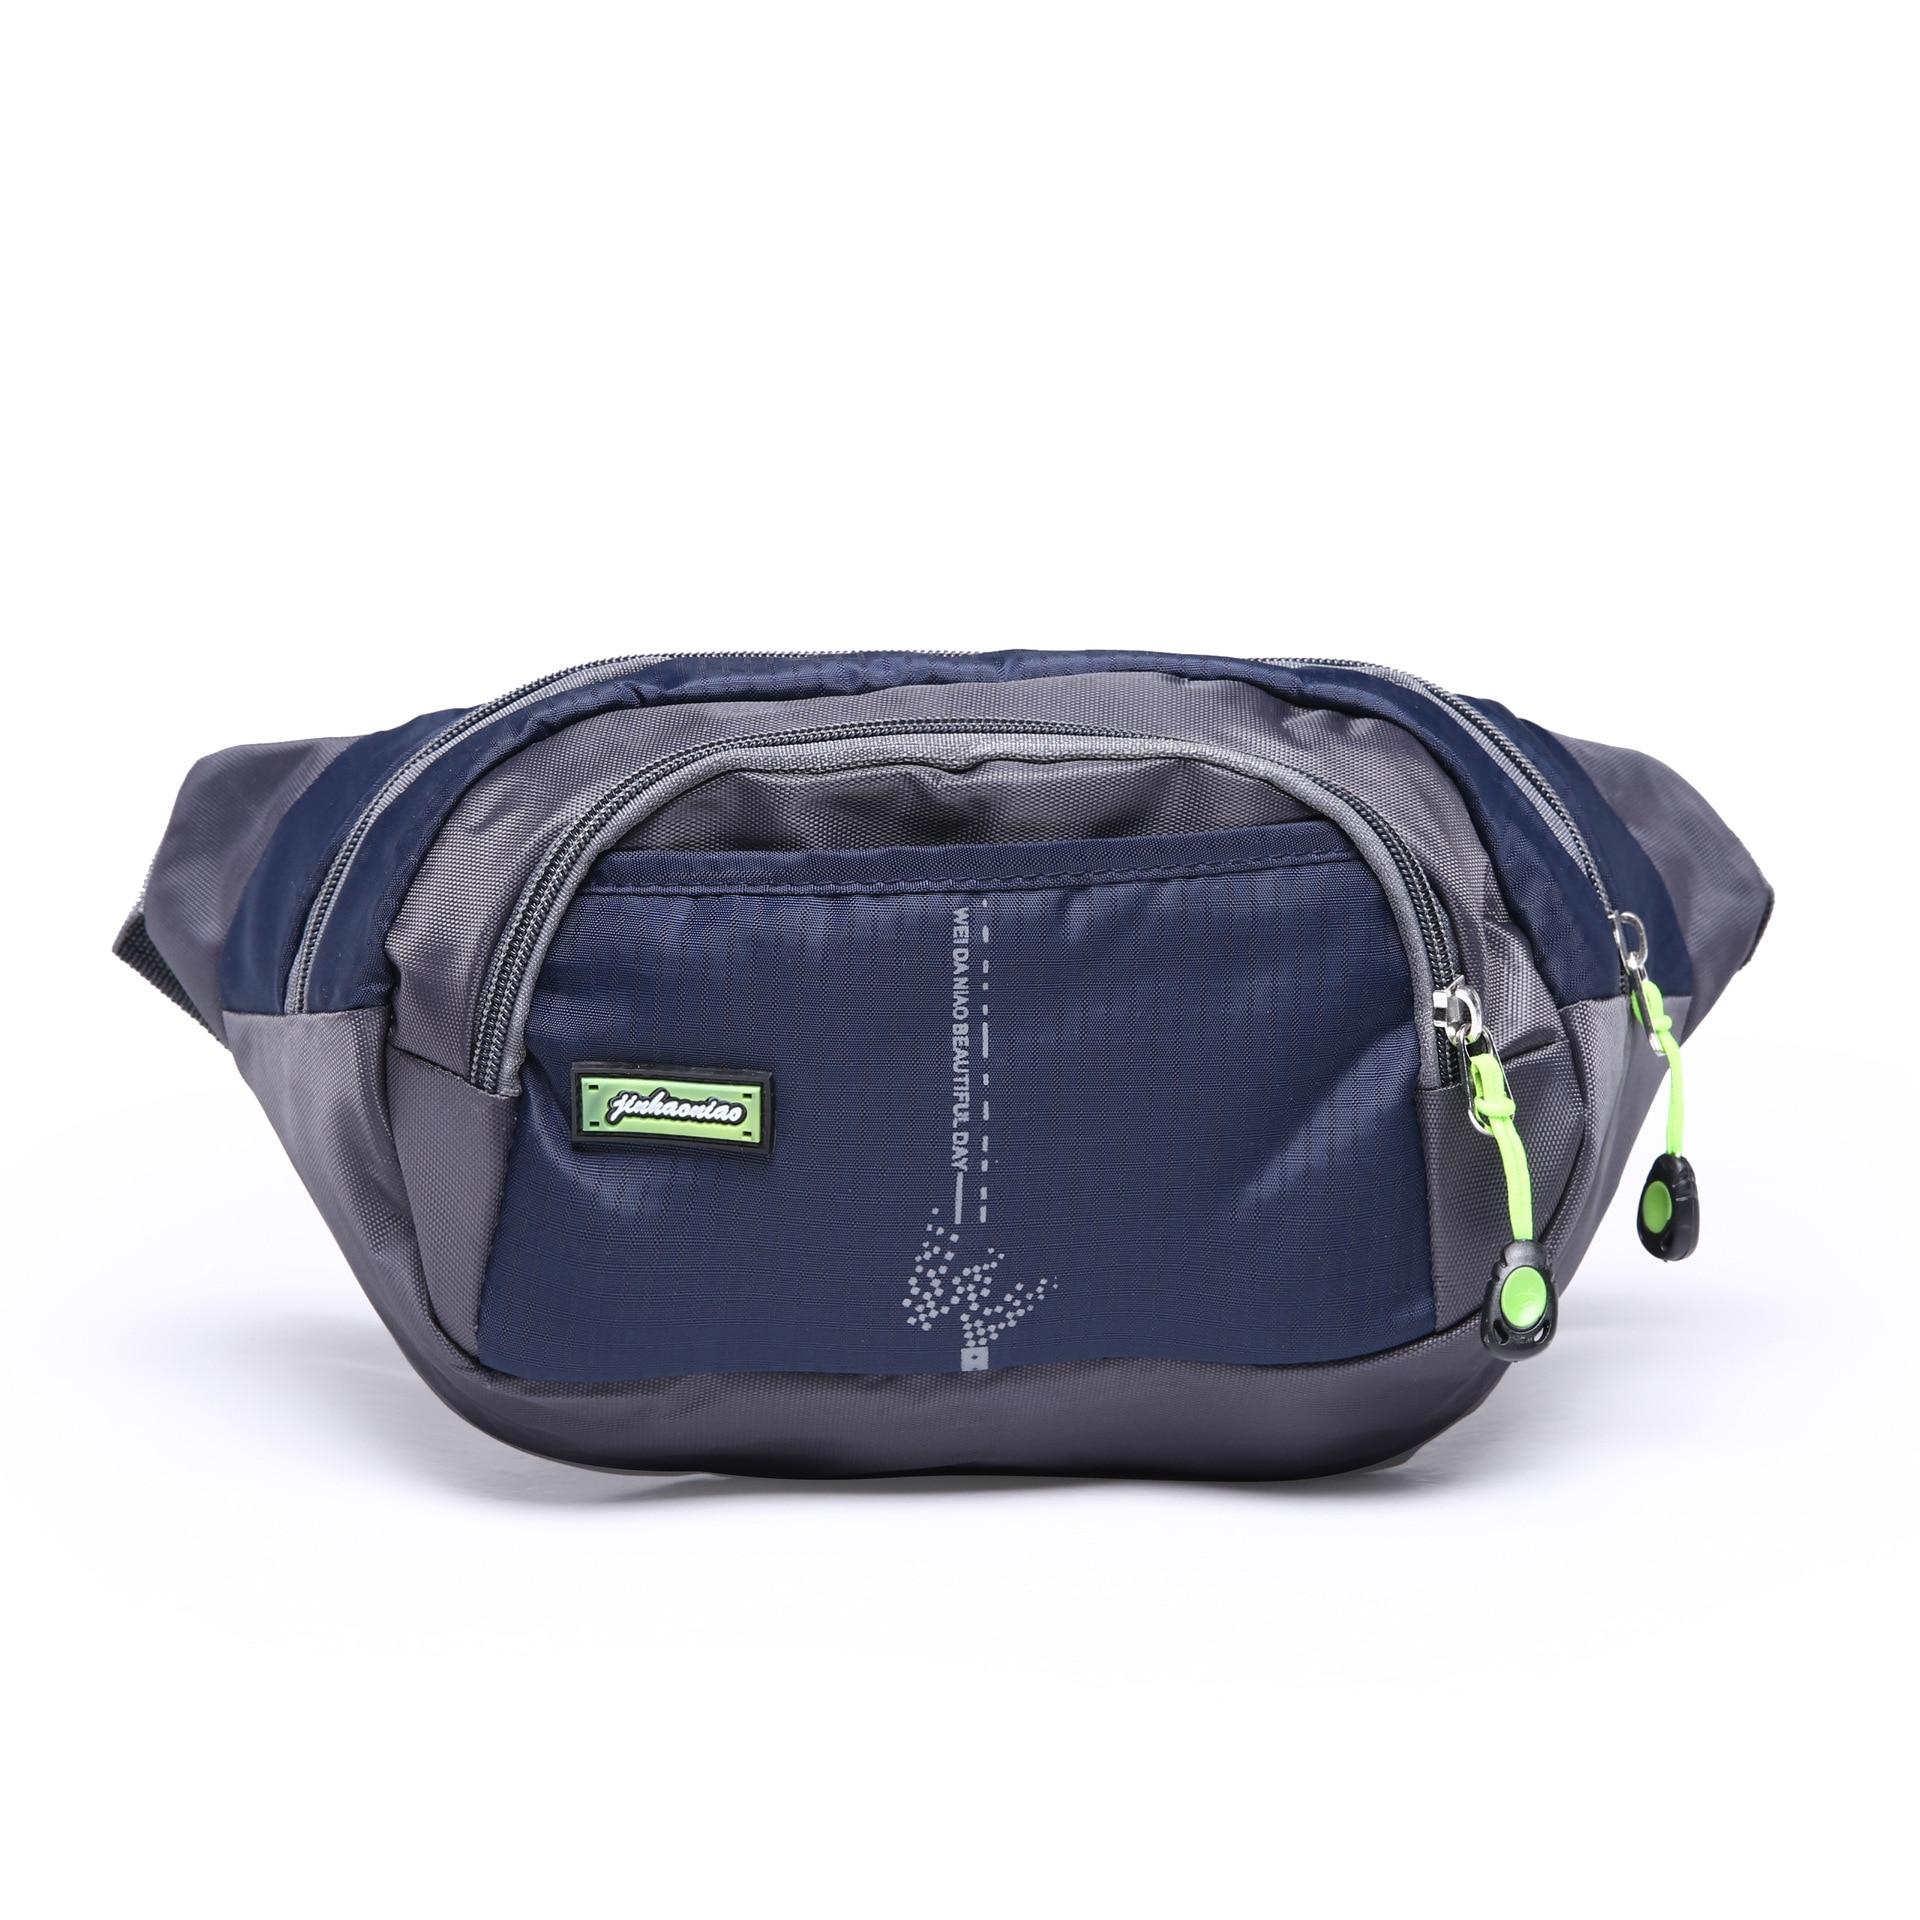 Unisex Sports Running Bum Bag Travel Handy Hiking Fanny Pack Waist Belt Pocket